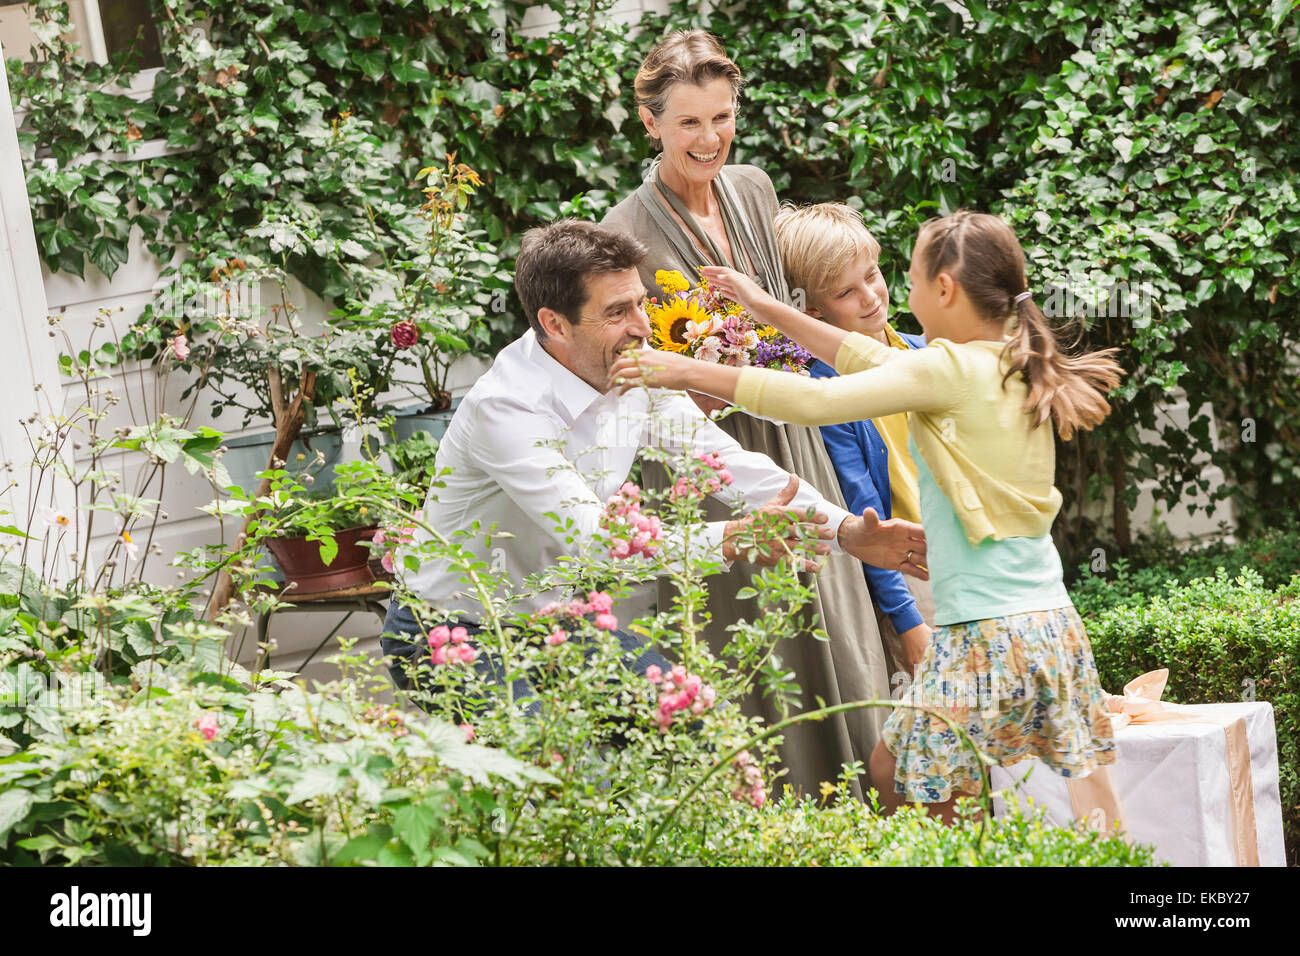 Coppia matura saluto nipoti in giardino Immagini Stock